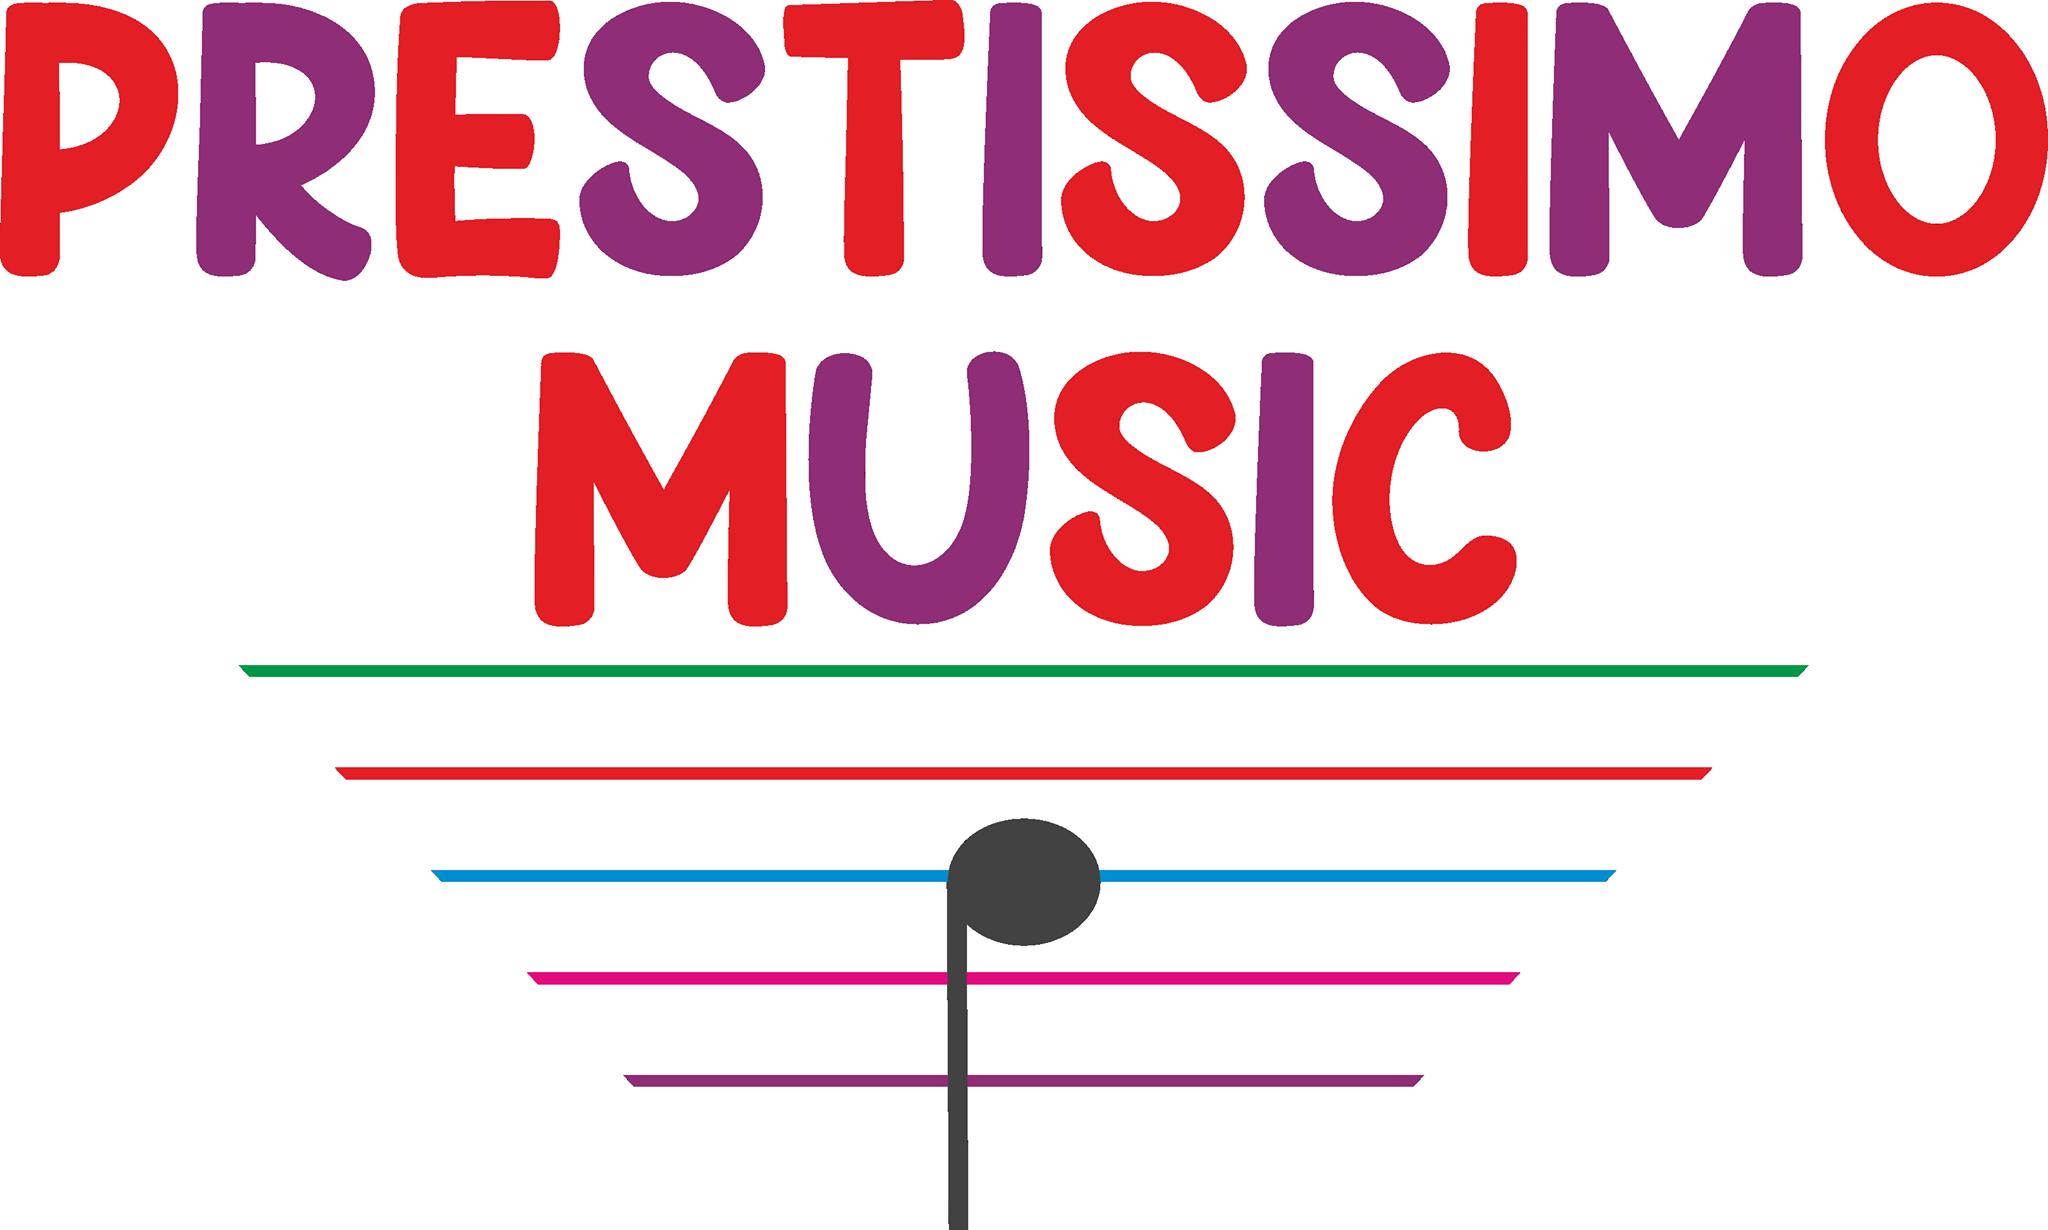 Prestissimo Music